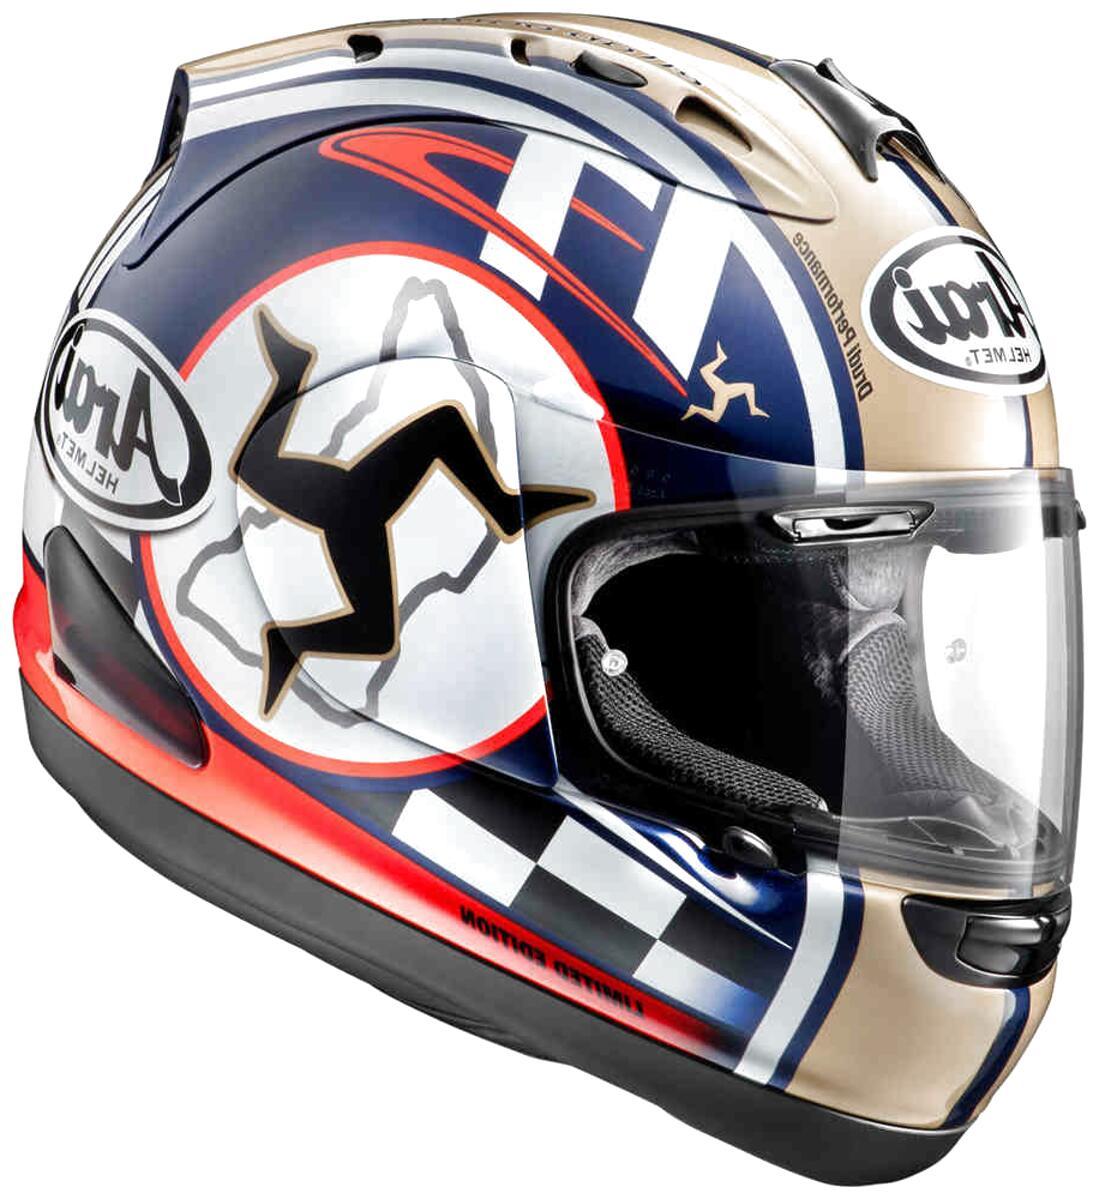 Arai Paranaso casco Arai RX7 GP Nero